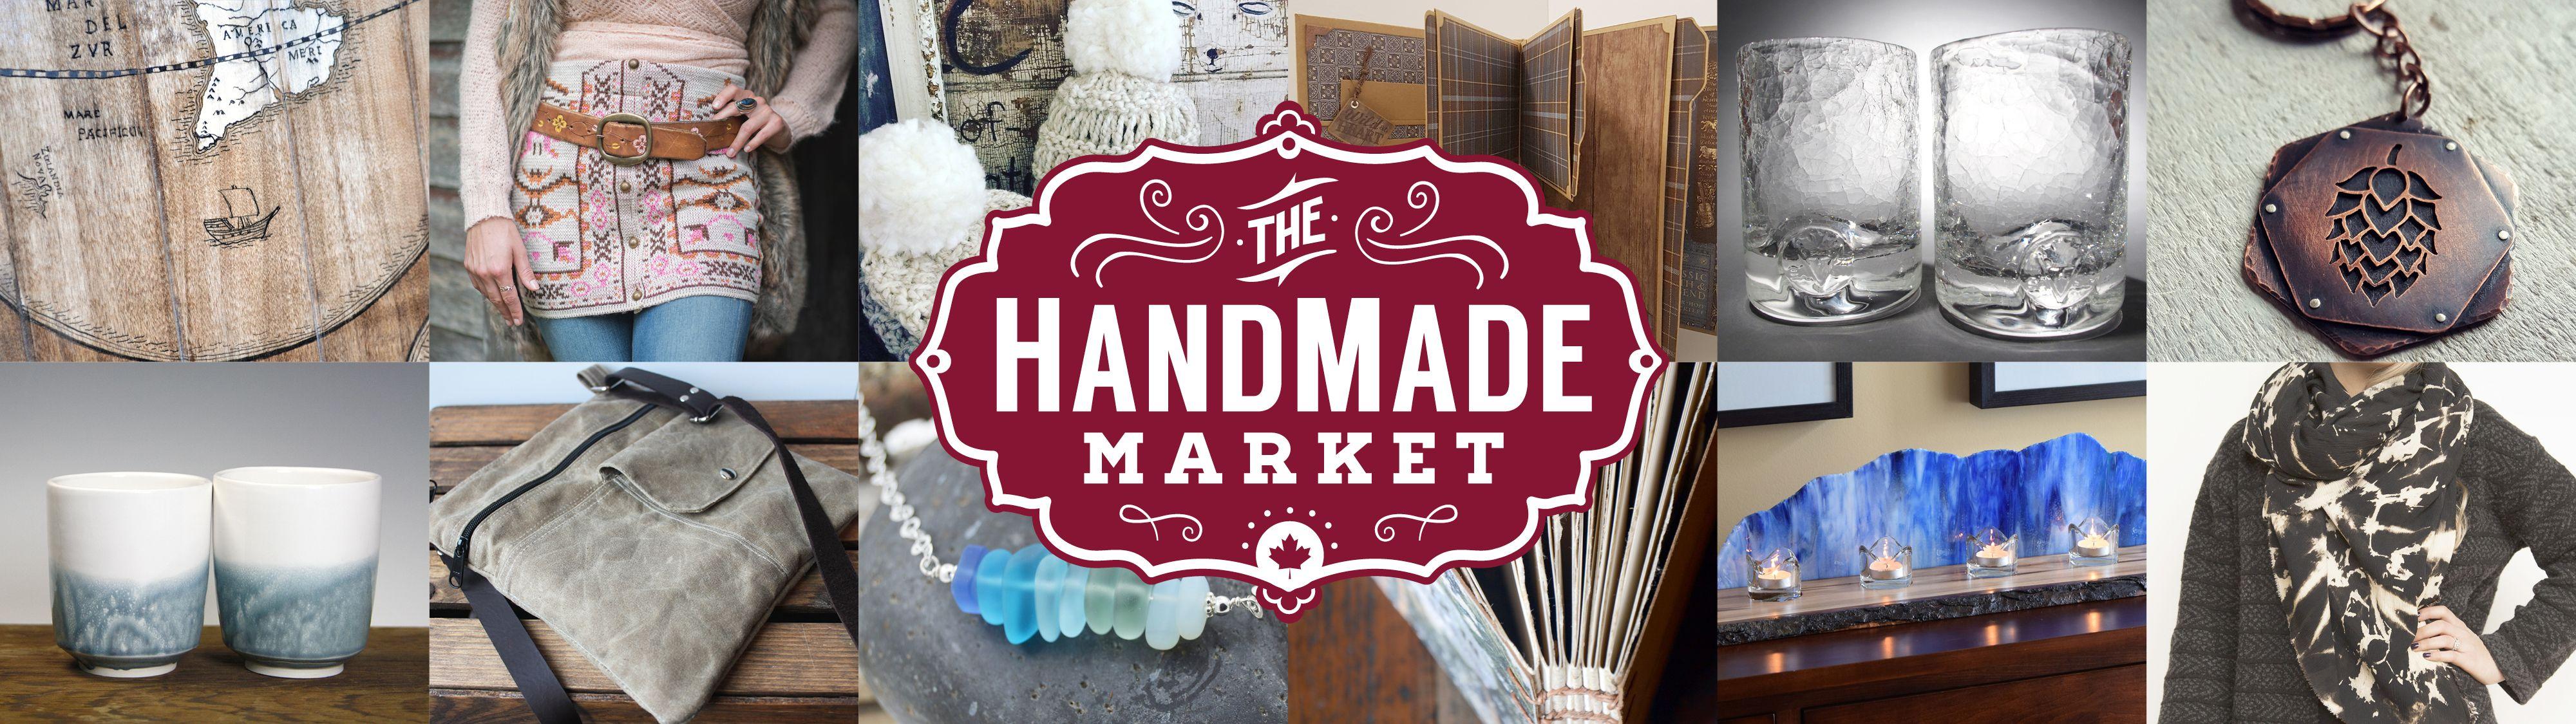 The Next HandMade Market